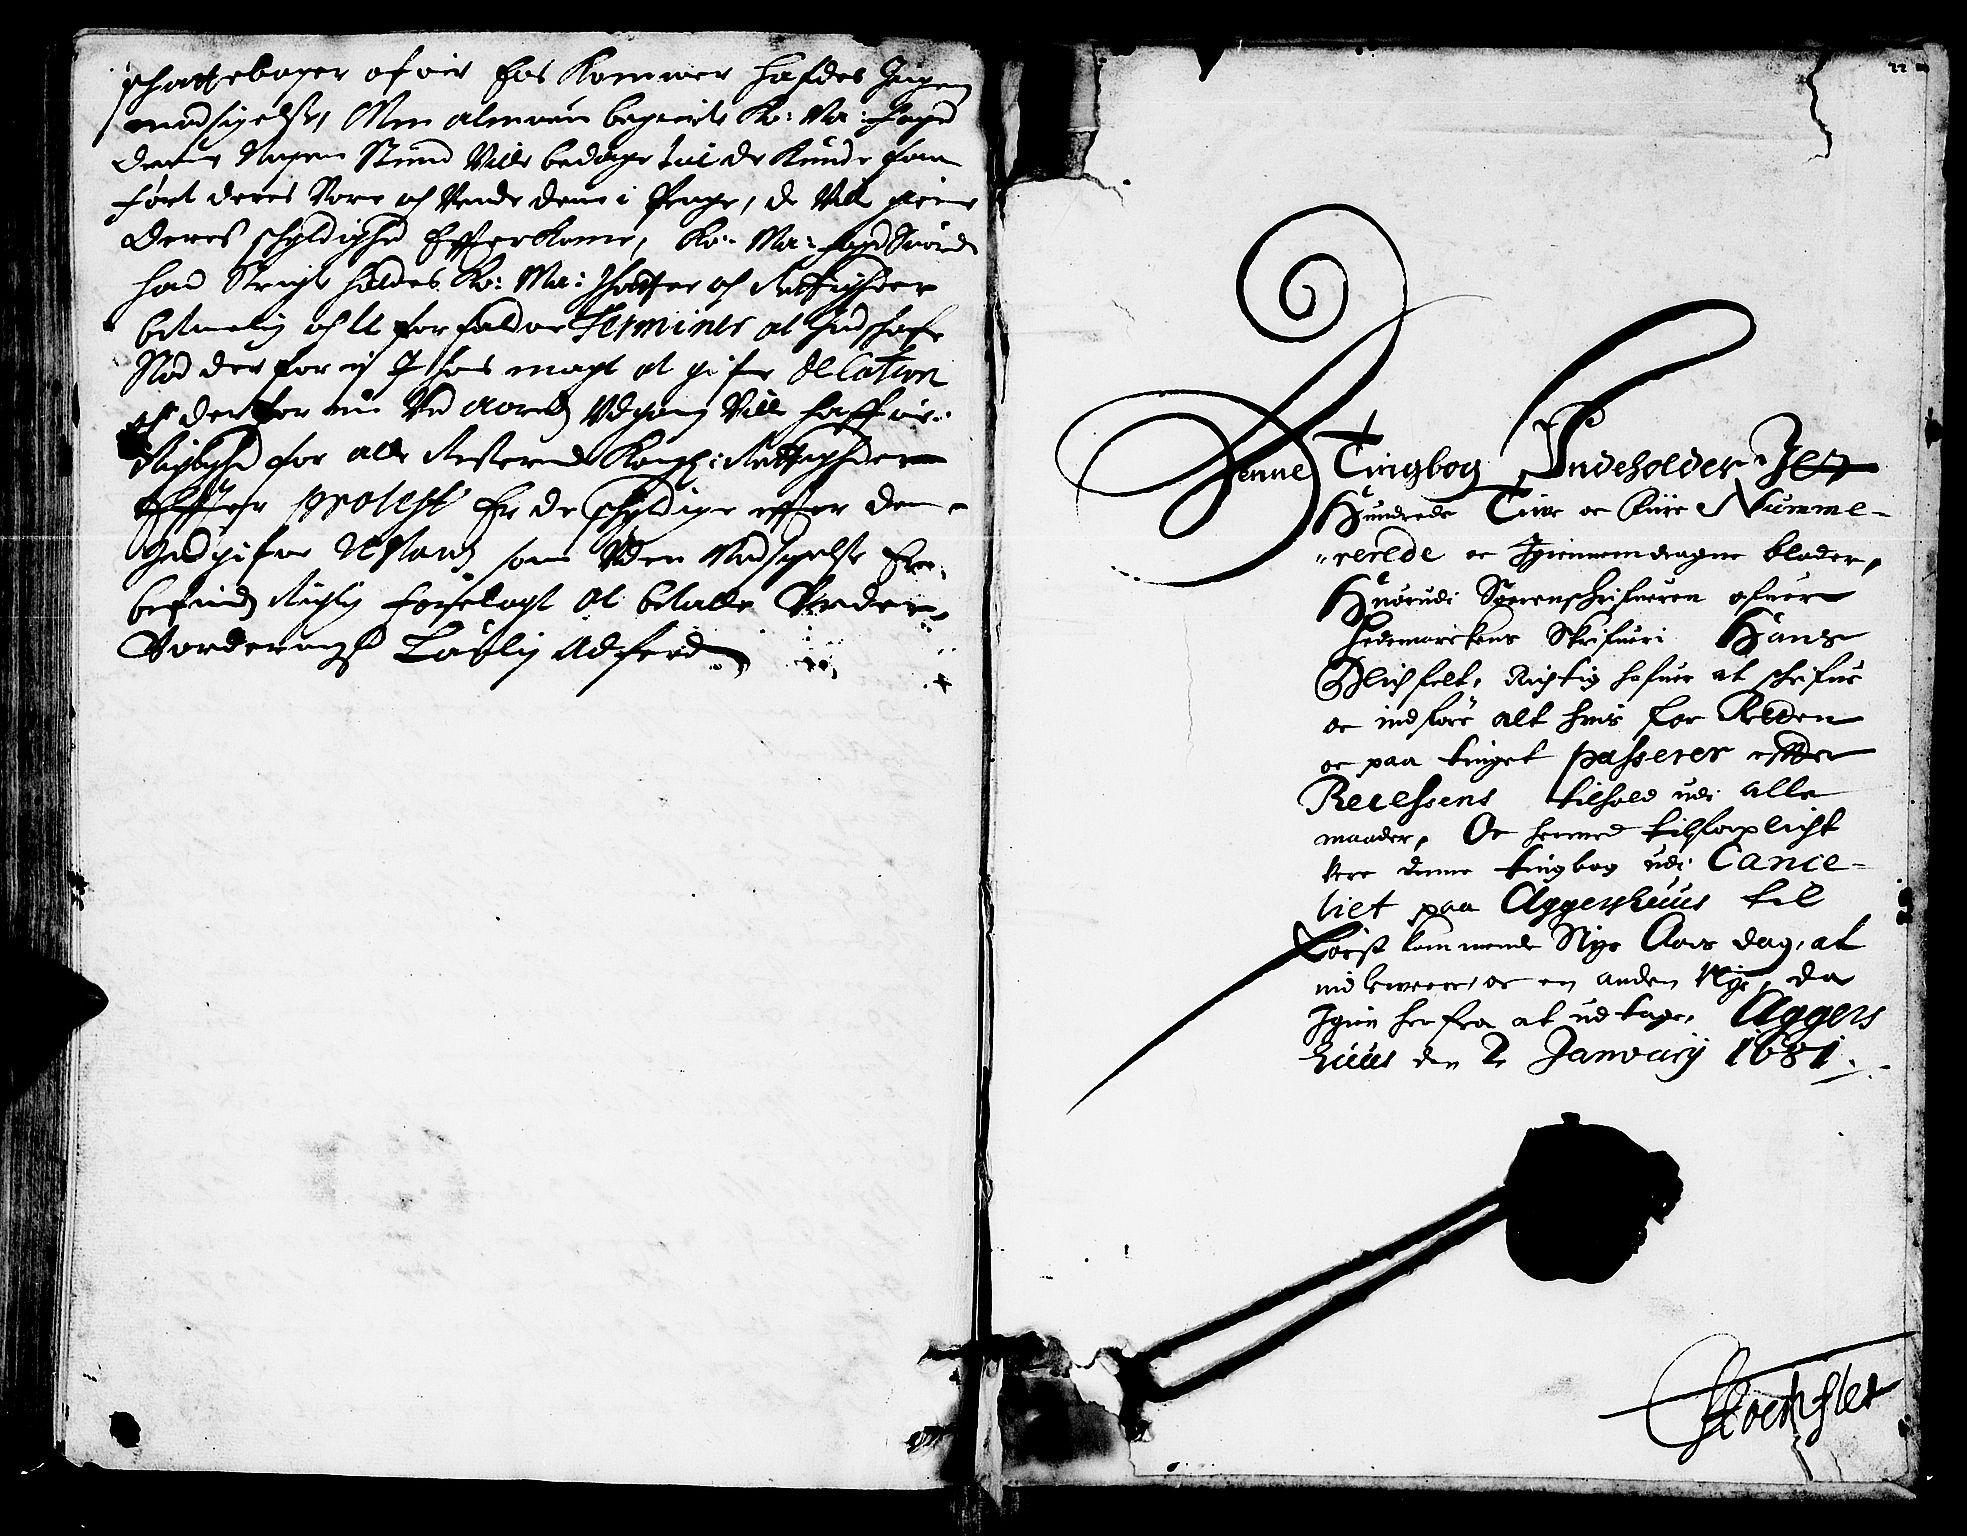 SAH, Hedemarken sorenskriveri, G/Gb/L0017: Tingbok, 1681, s. 124b-125a